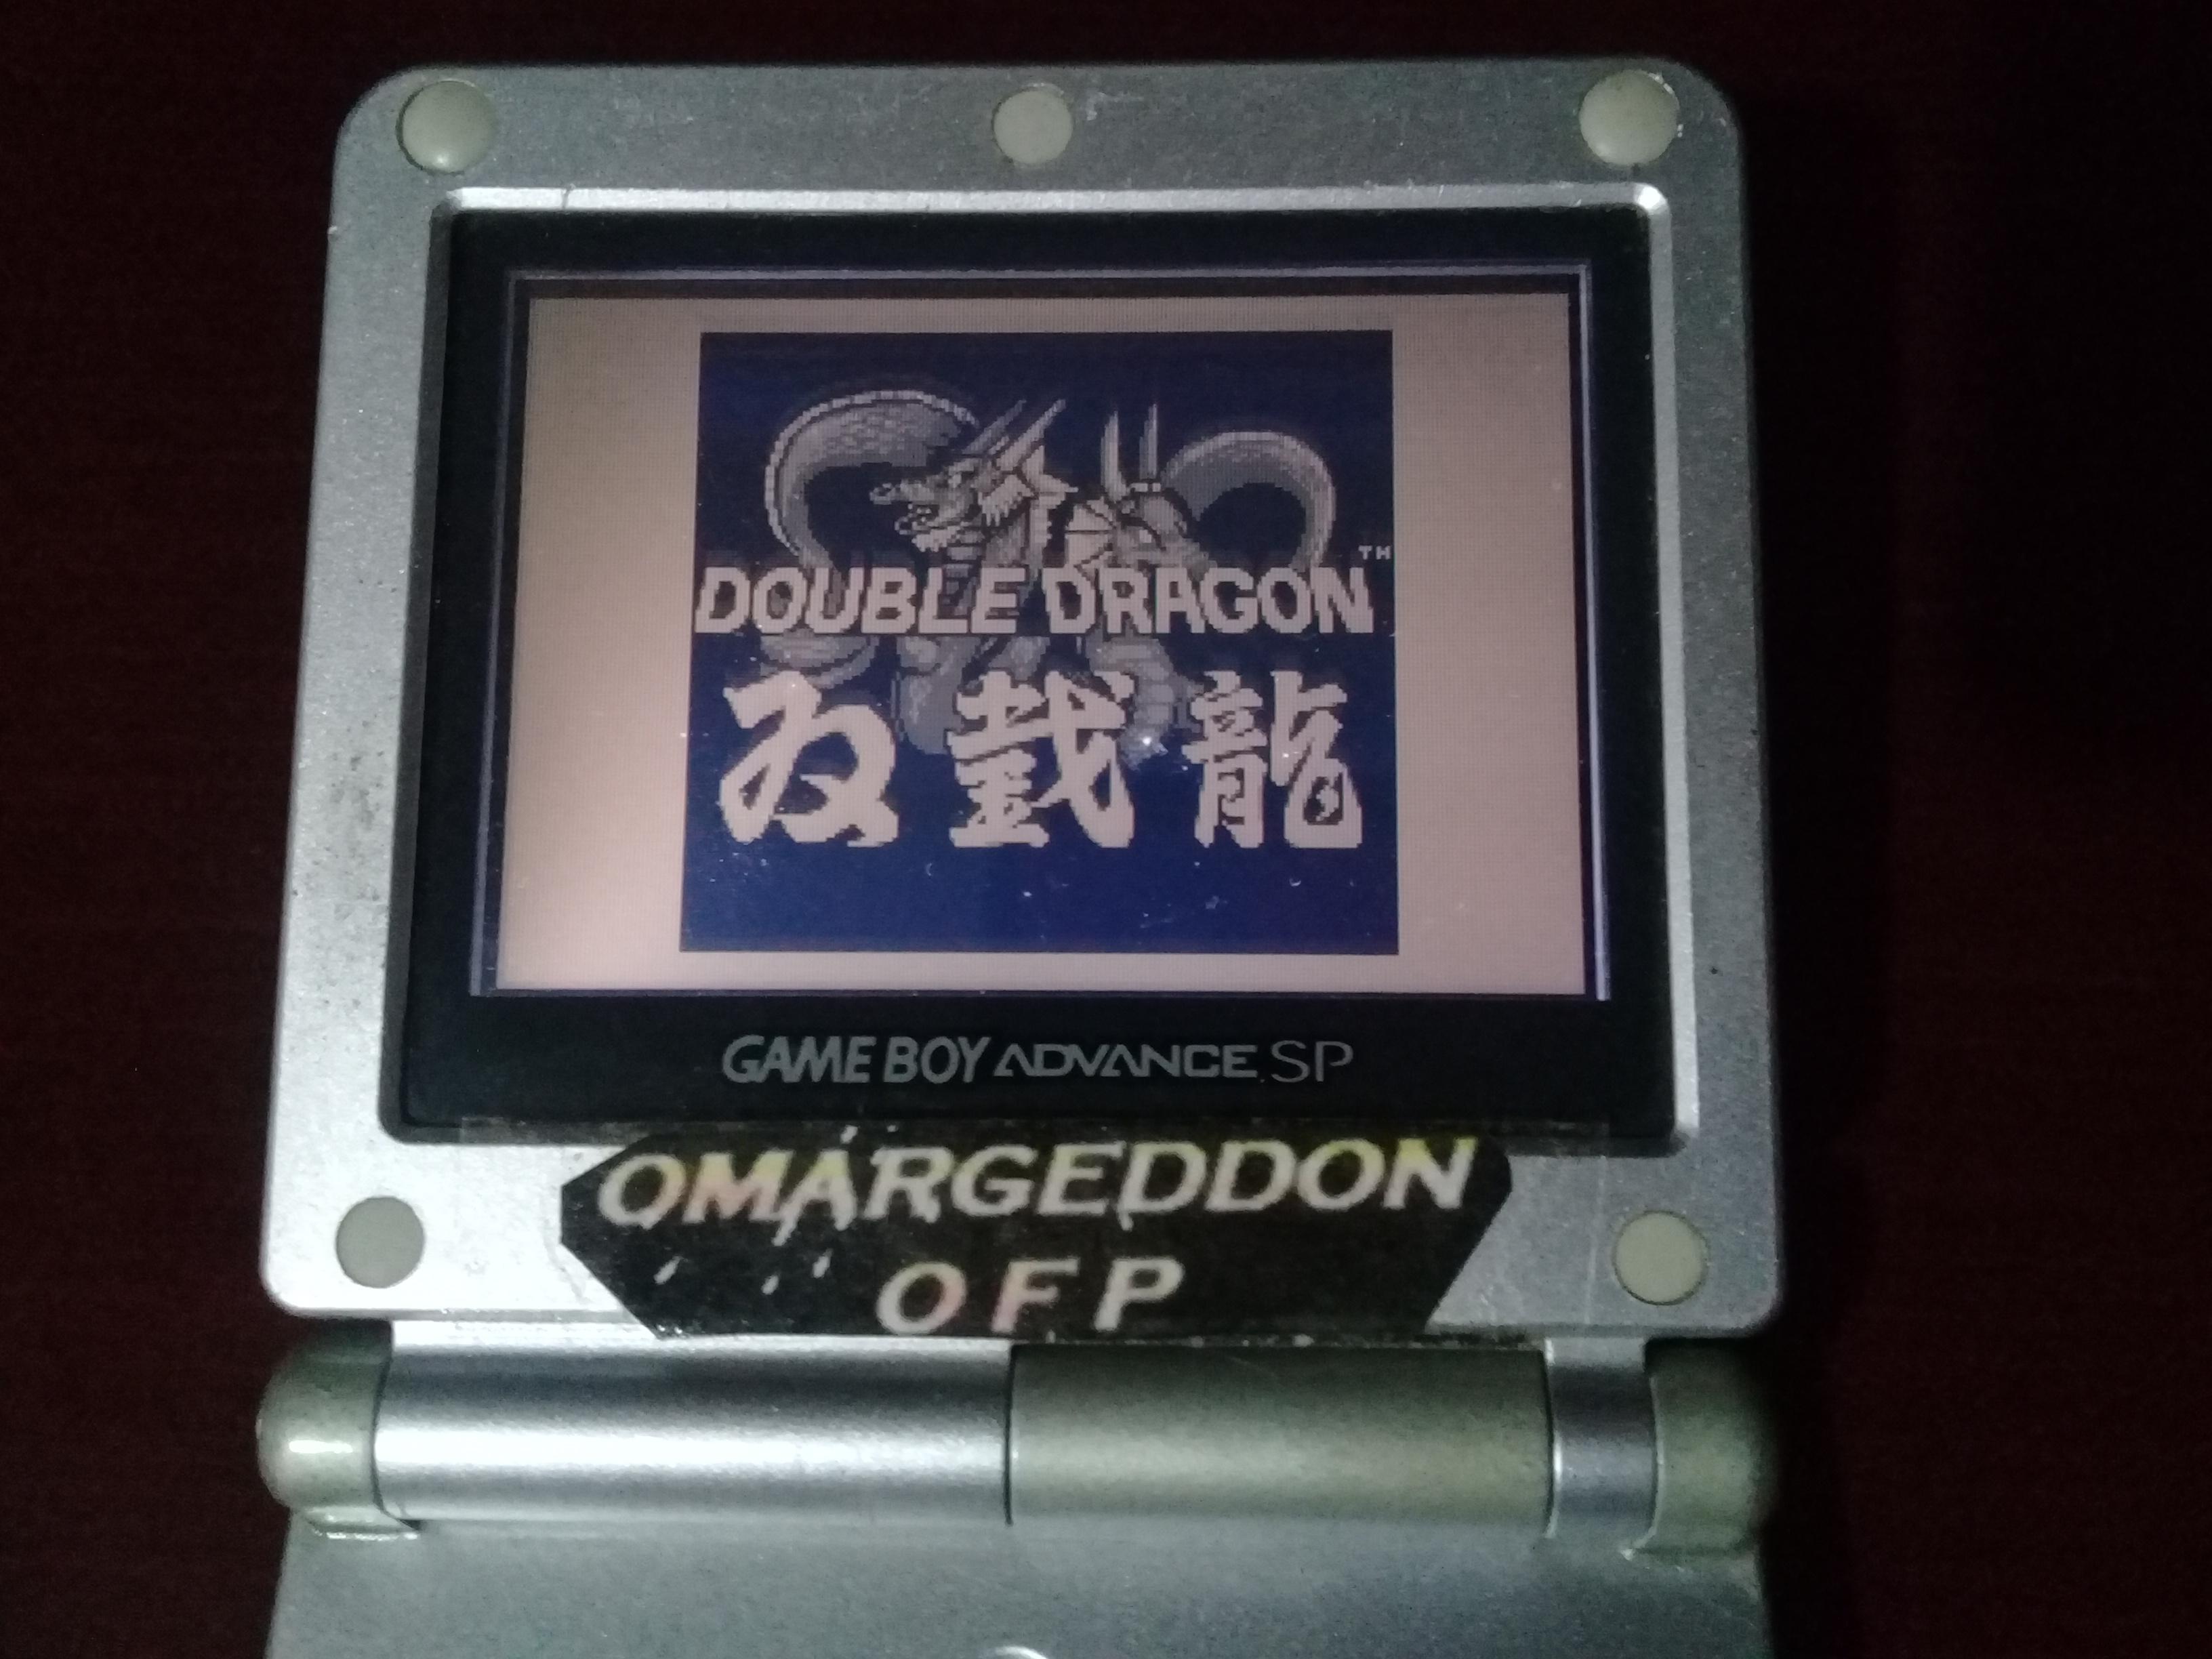 omargeddon: Double Dragon (Game Boy) 19,170 points on 2019-01-12 16:38:53